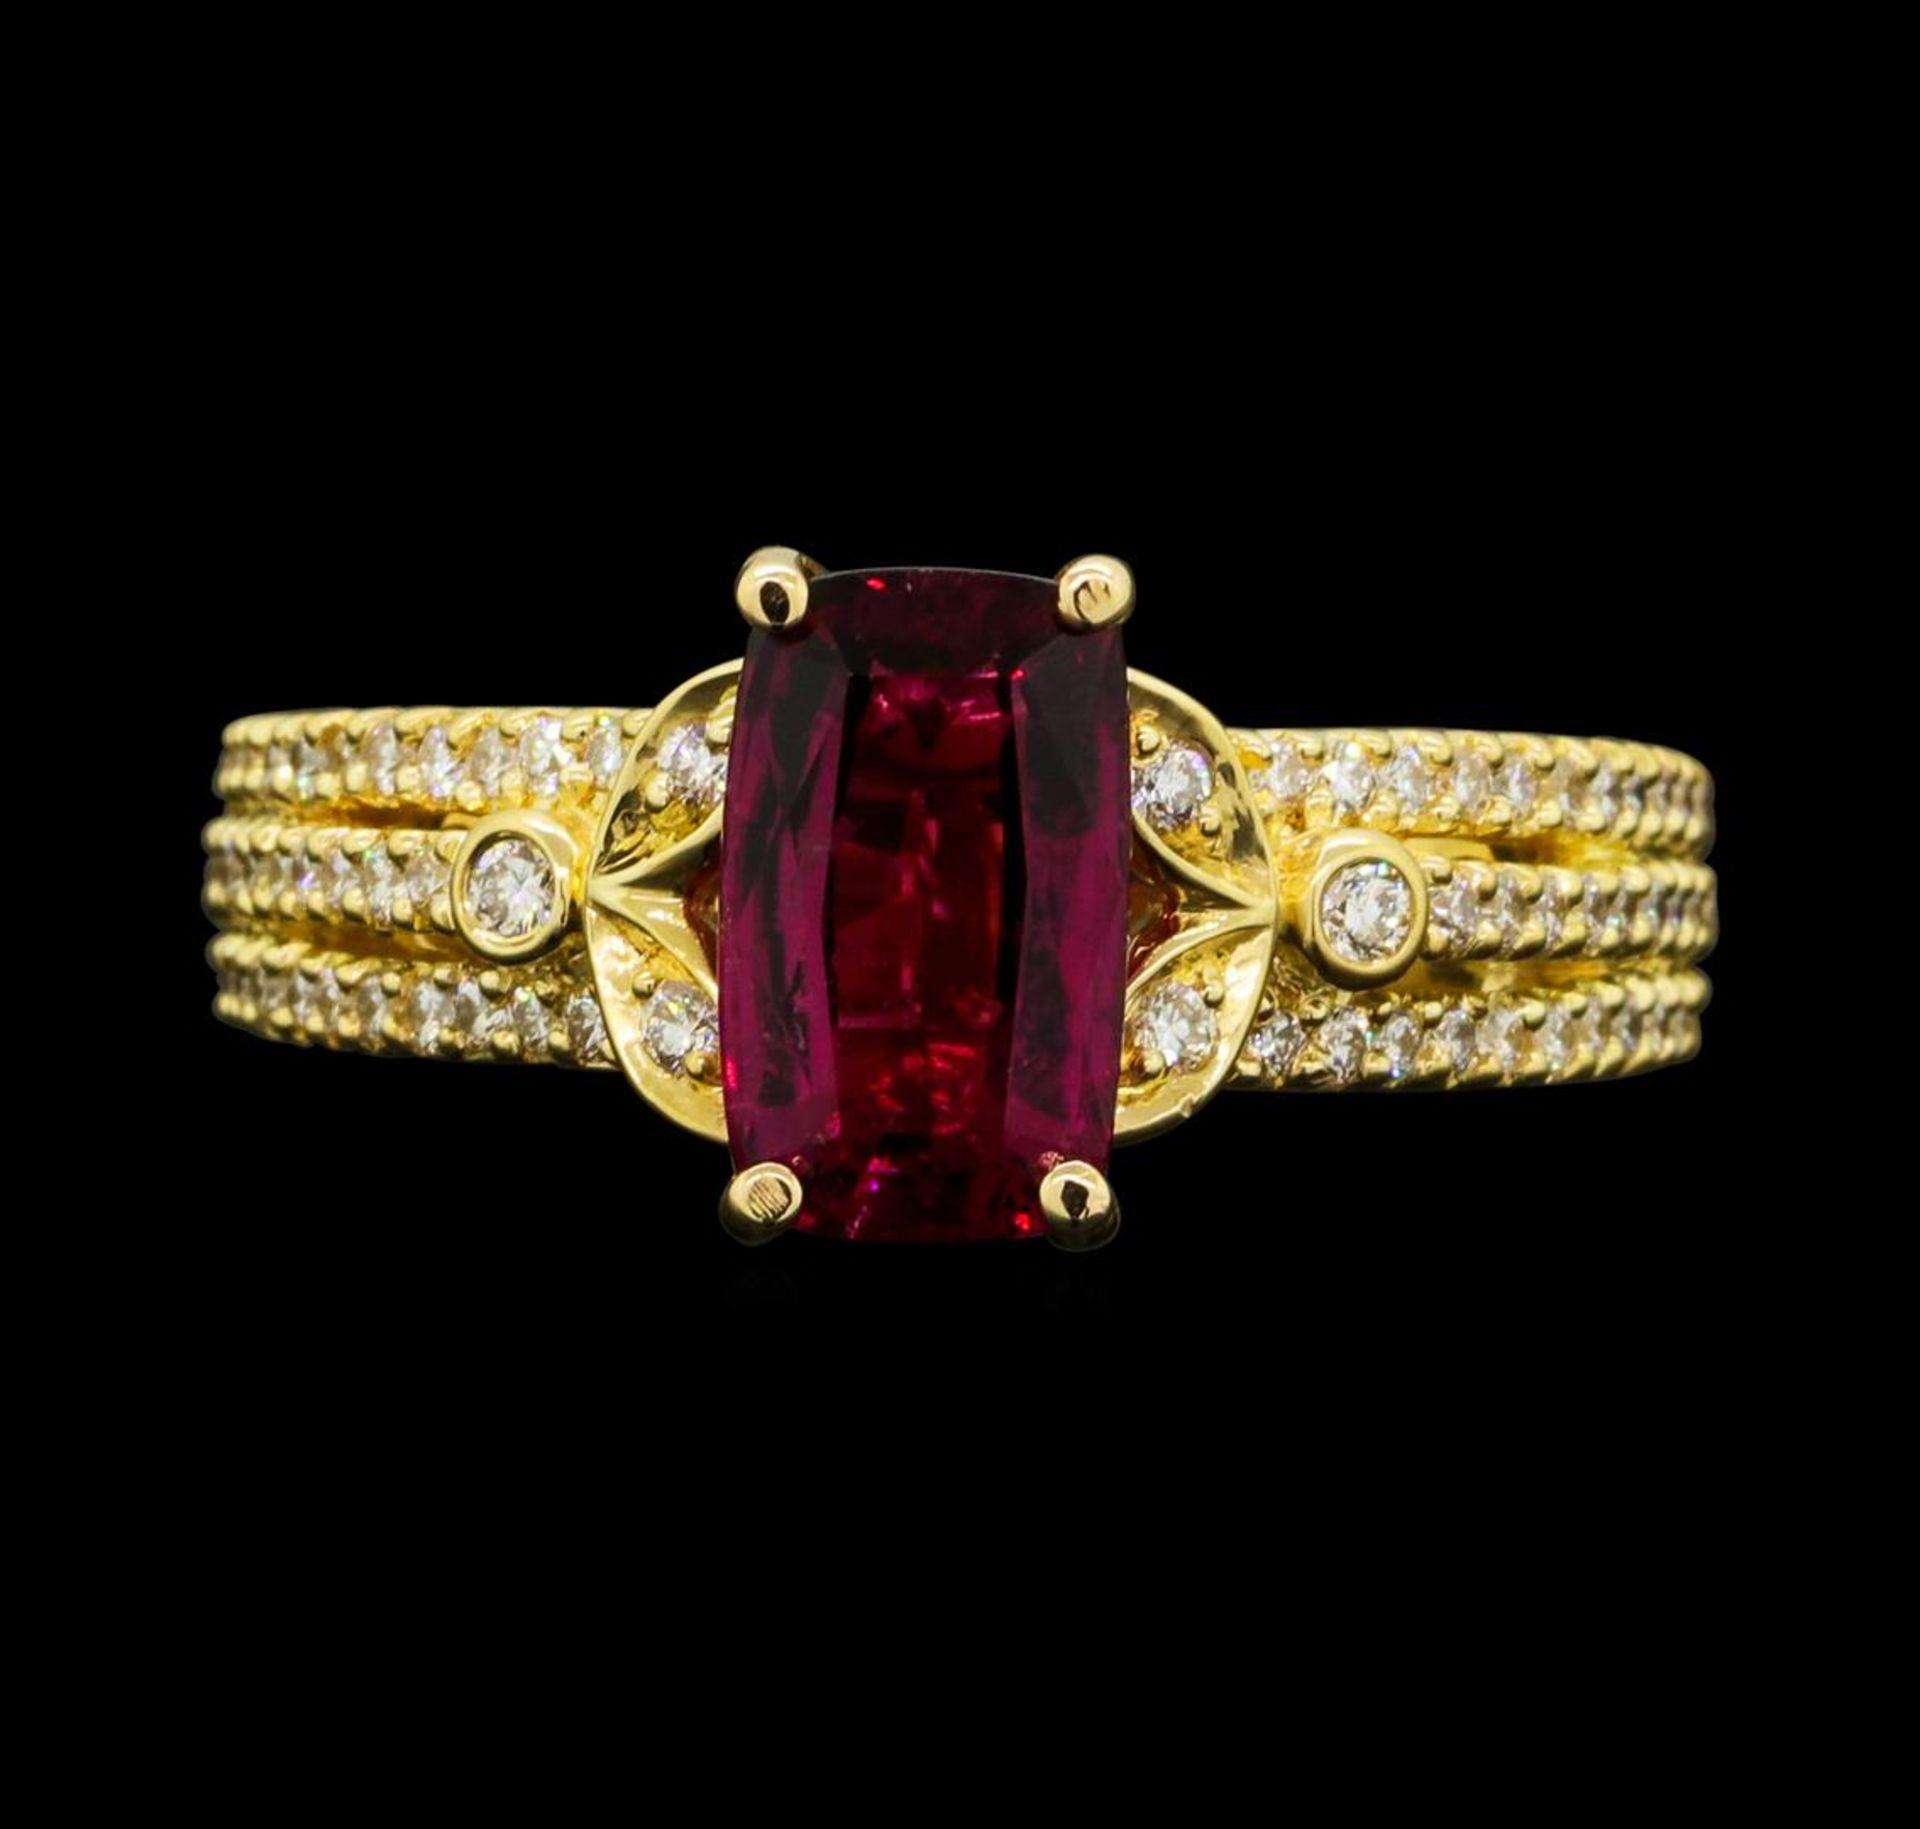 1.50 ct Pink Tourmaling And Diamond Ring - 18KT Yellow Gold - Image 2 of 5